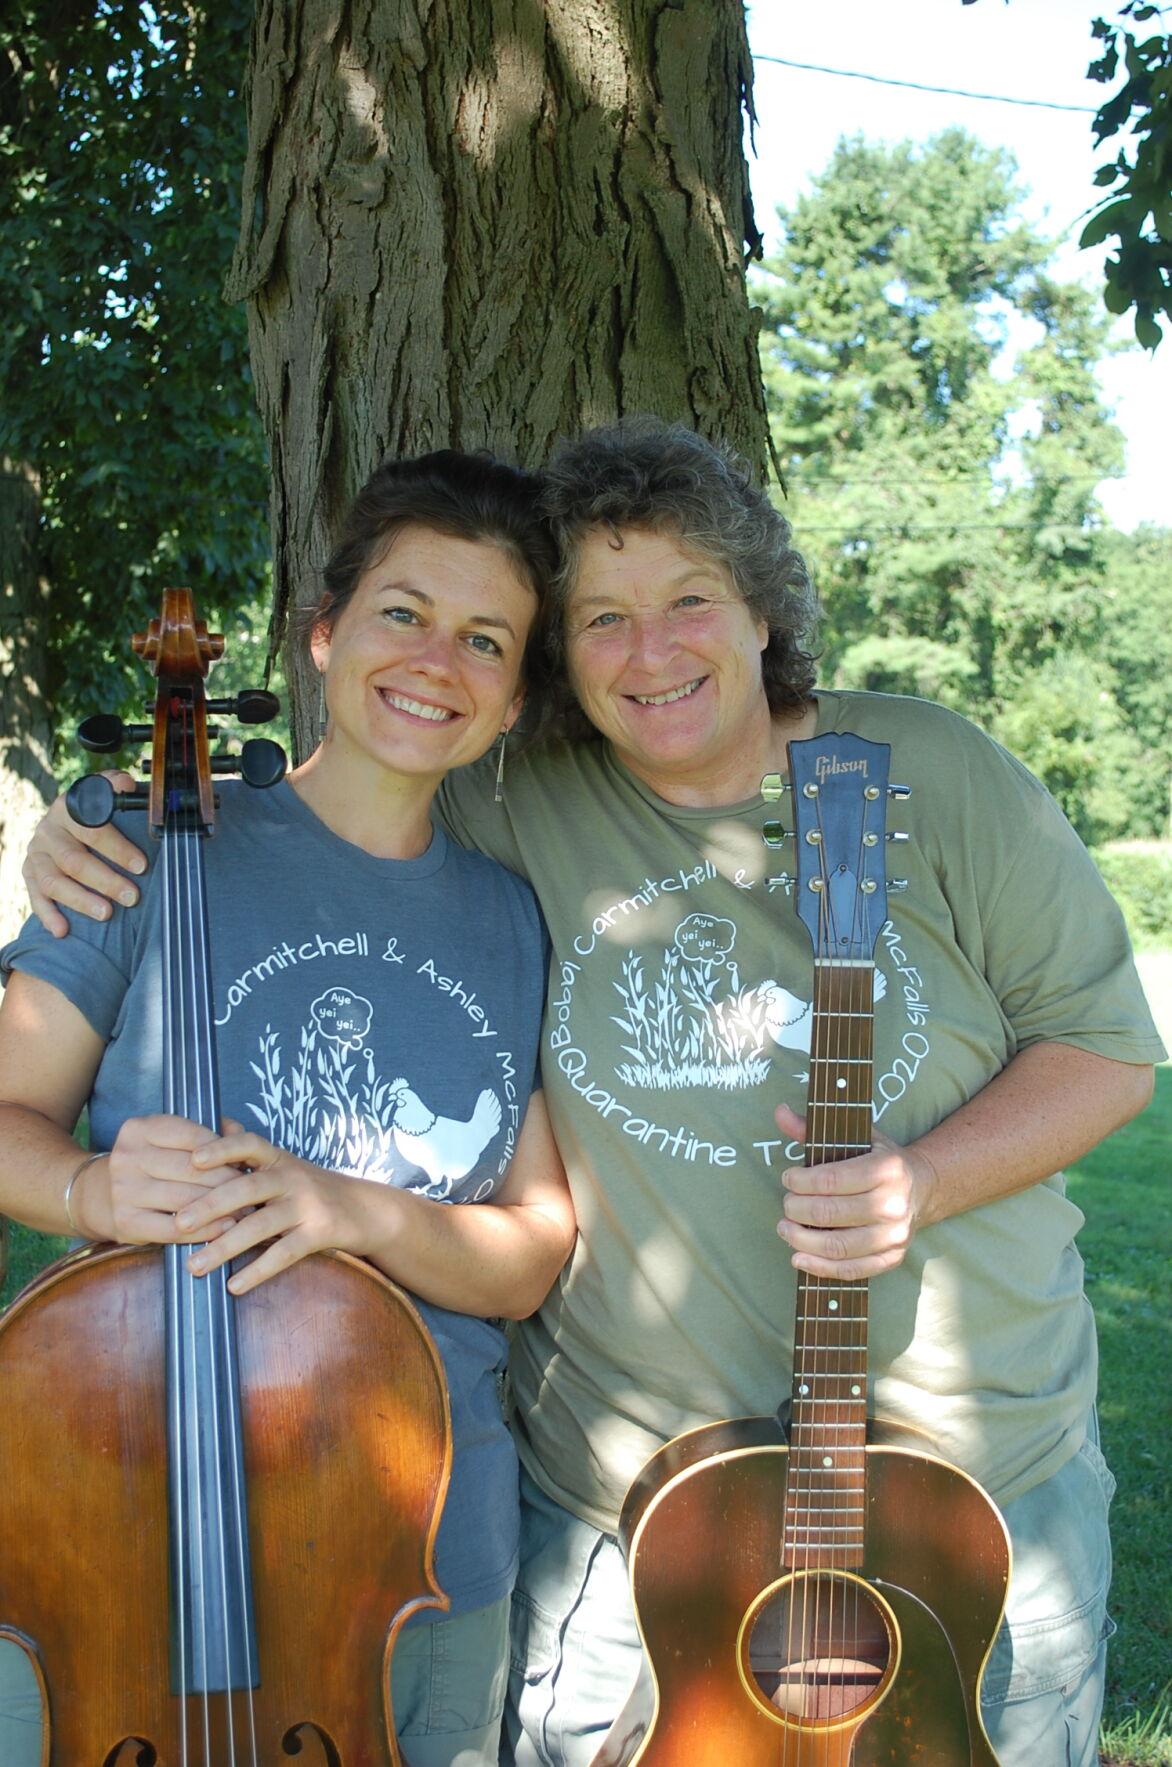 Bobbi Carmitchell and Ashley McFalls